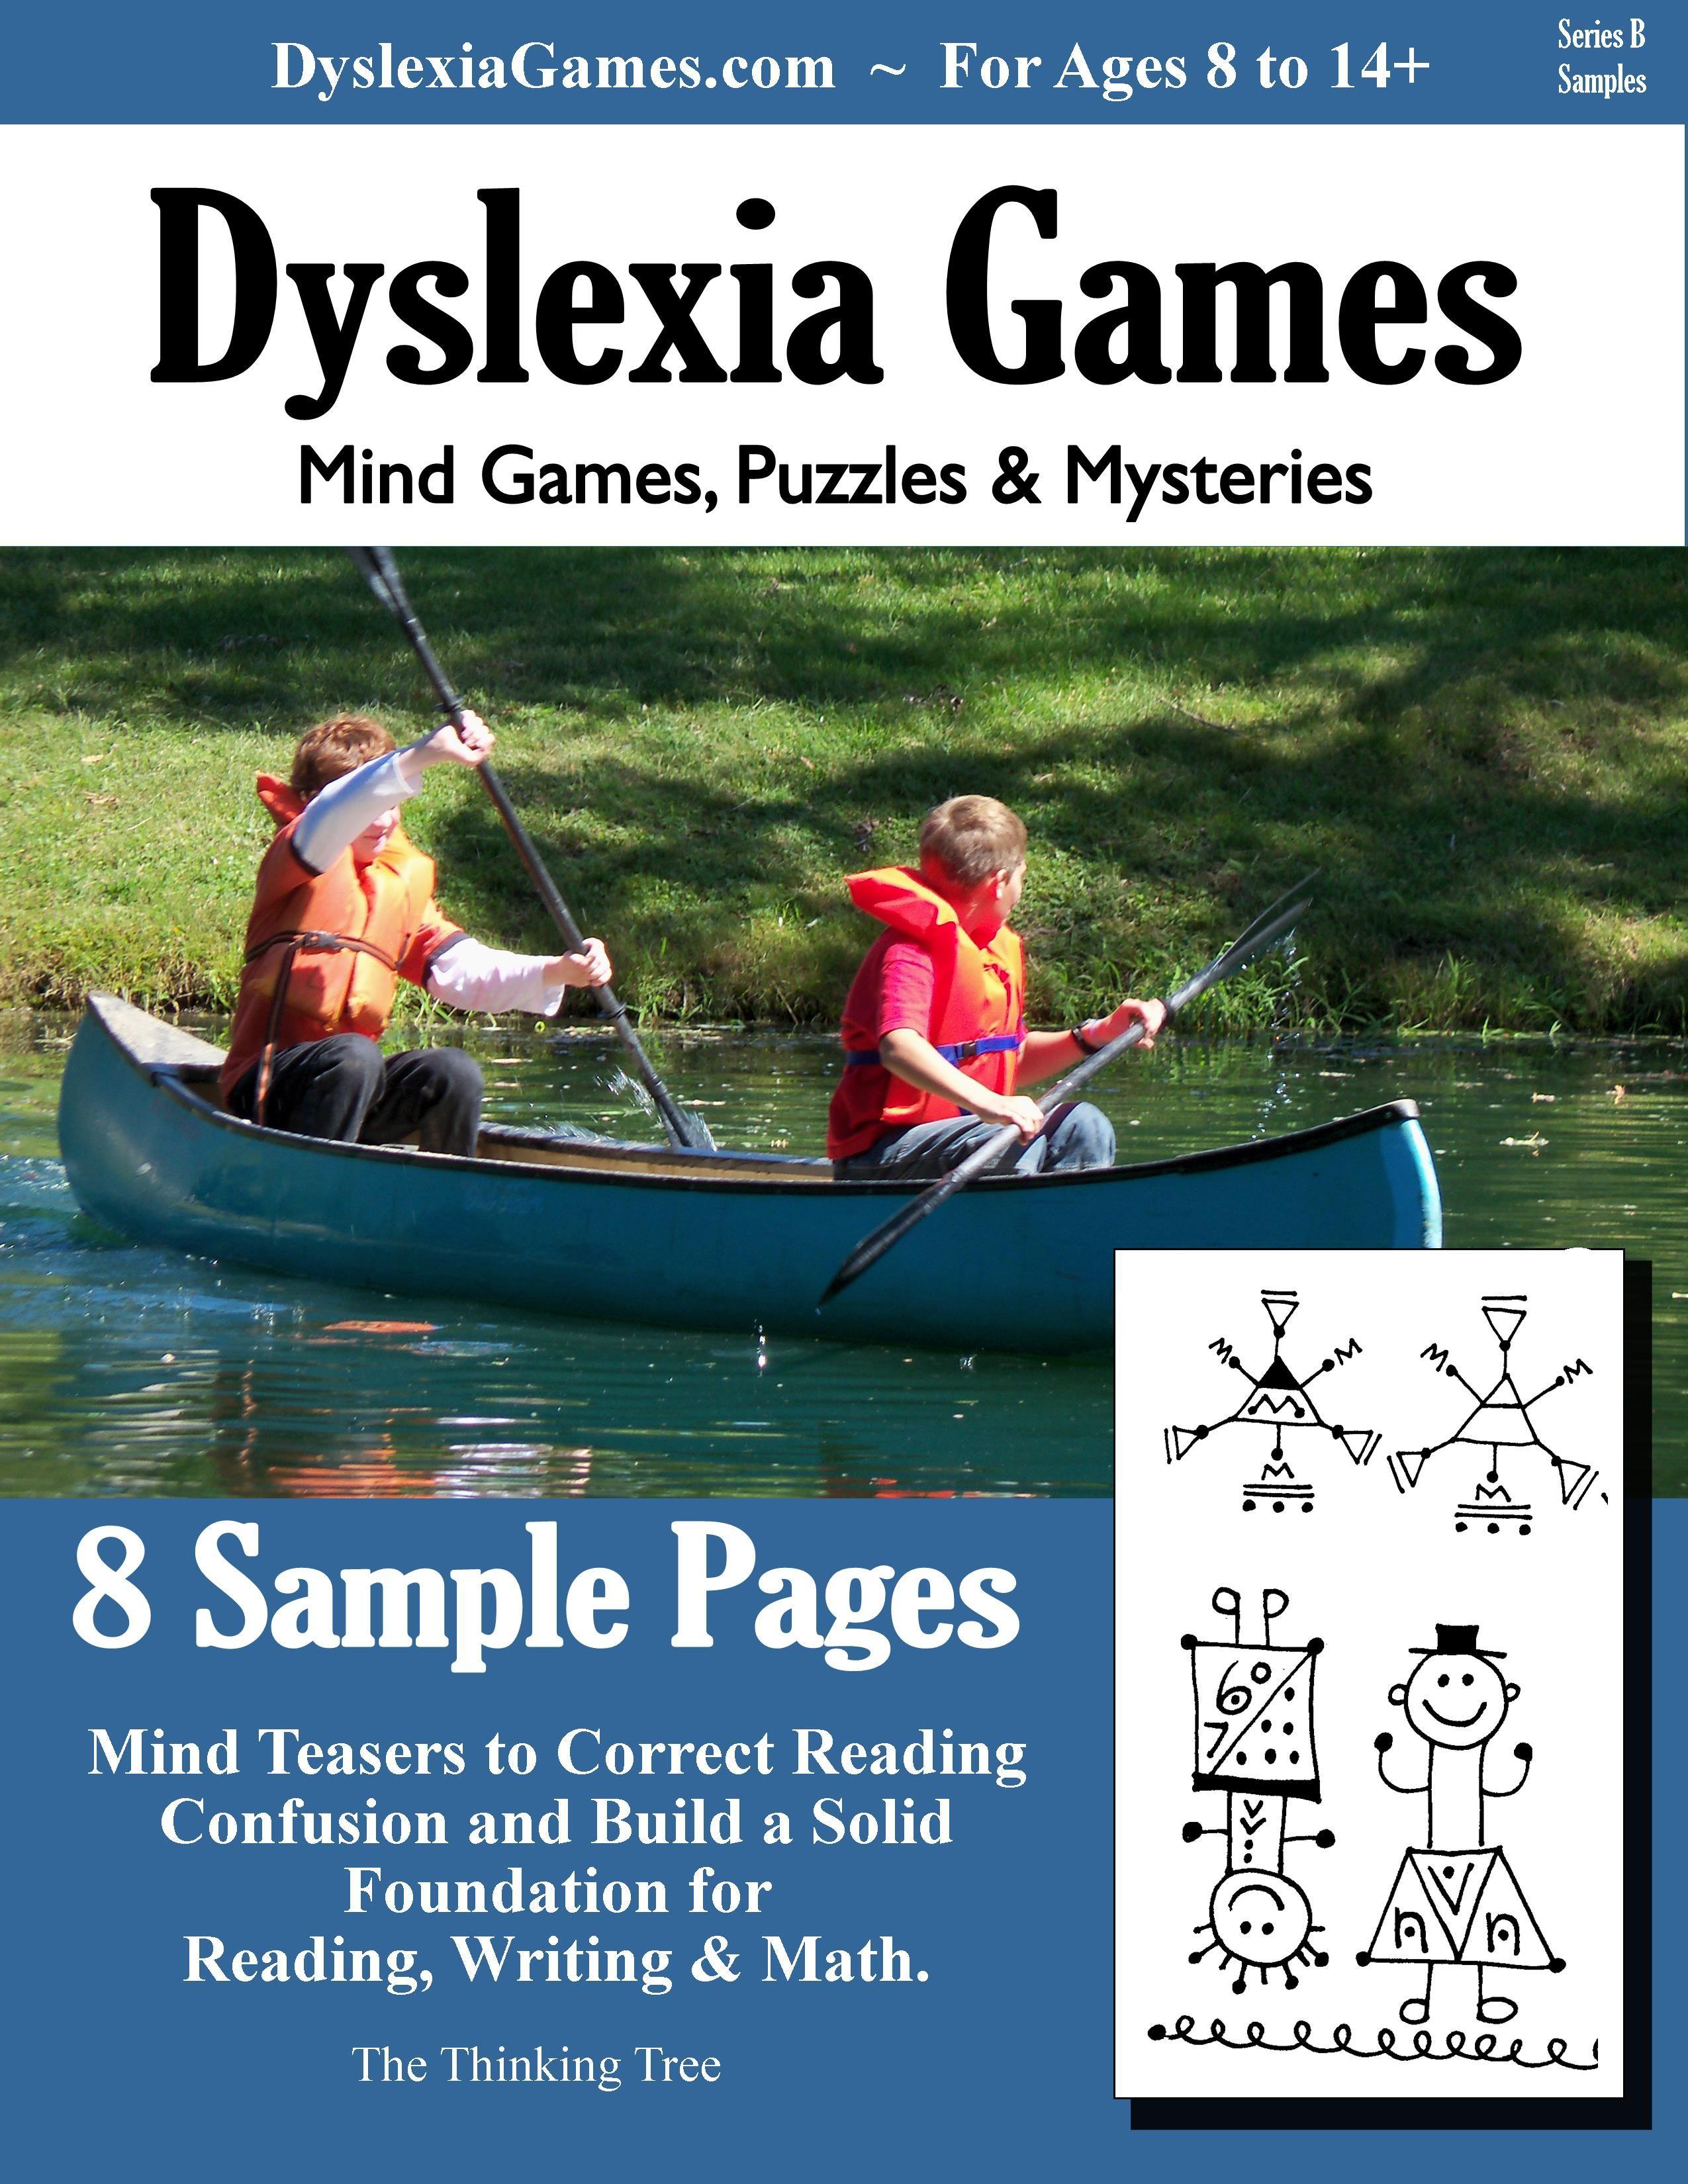 Pin By Leslie Myjak On Dyslexia